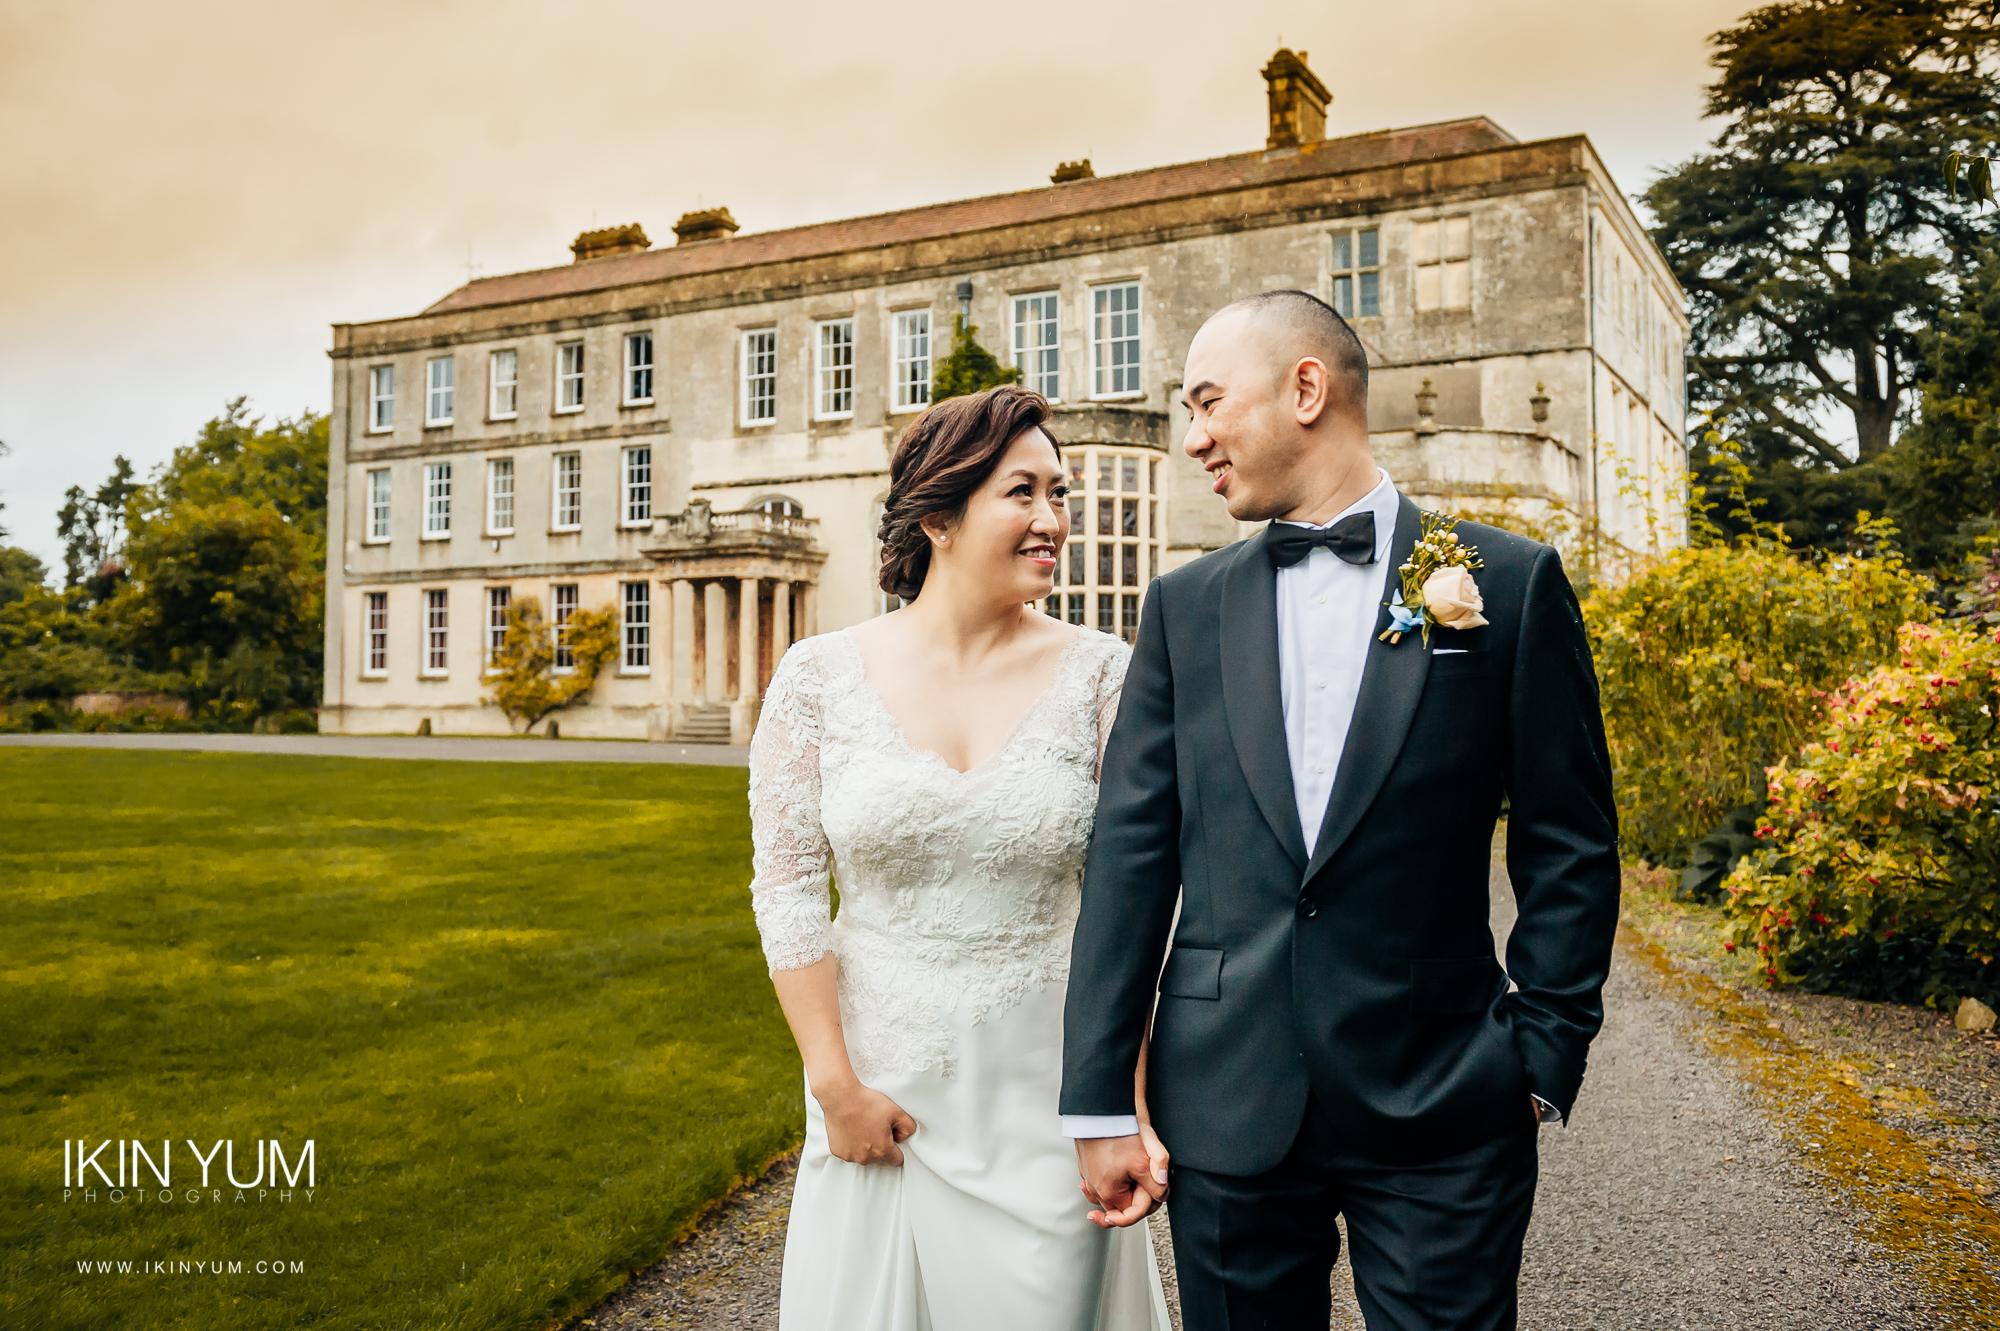 Elmore Court Wedding- Ikin Yum Photography-0074.jpg